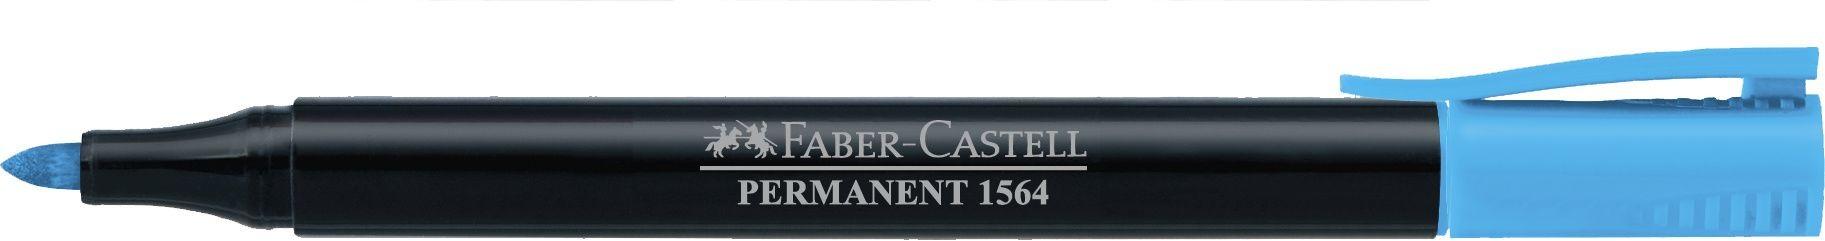 MARKER PERMANENT BLEU SLIM 1564 FABER-CASTELL